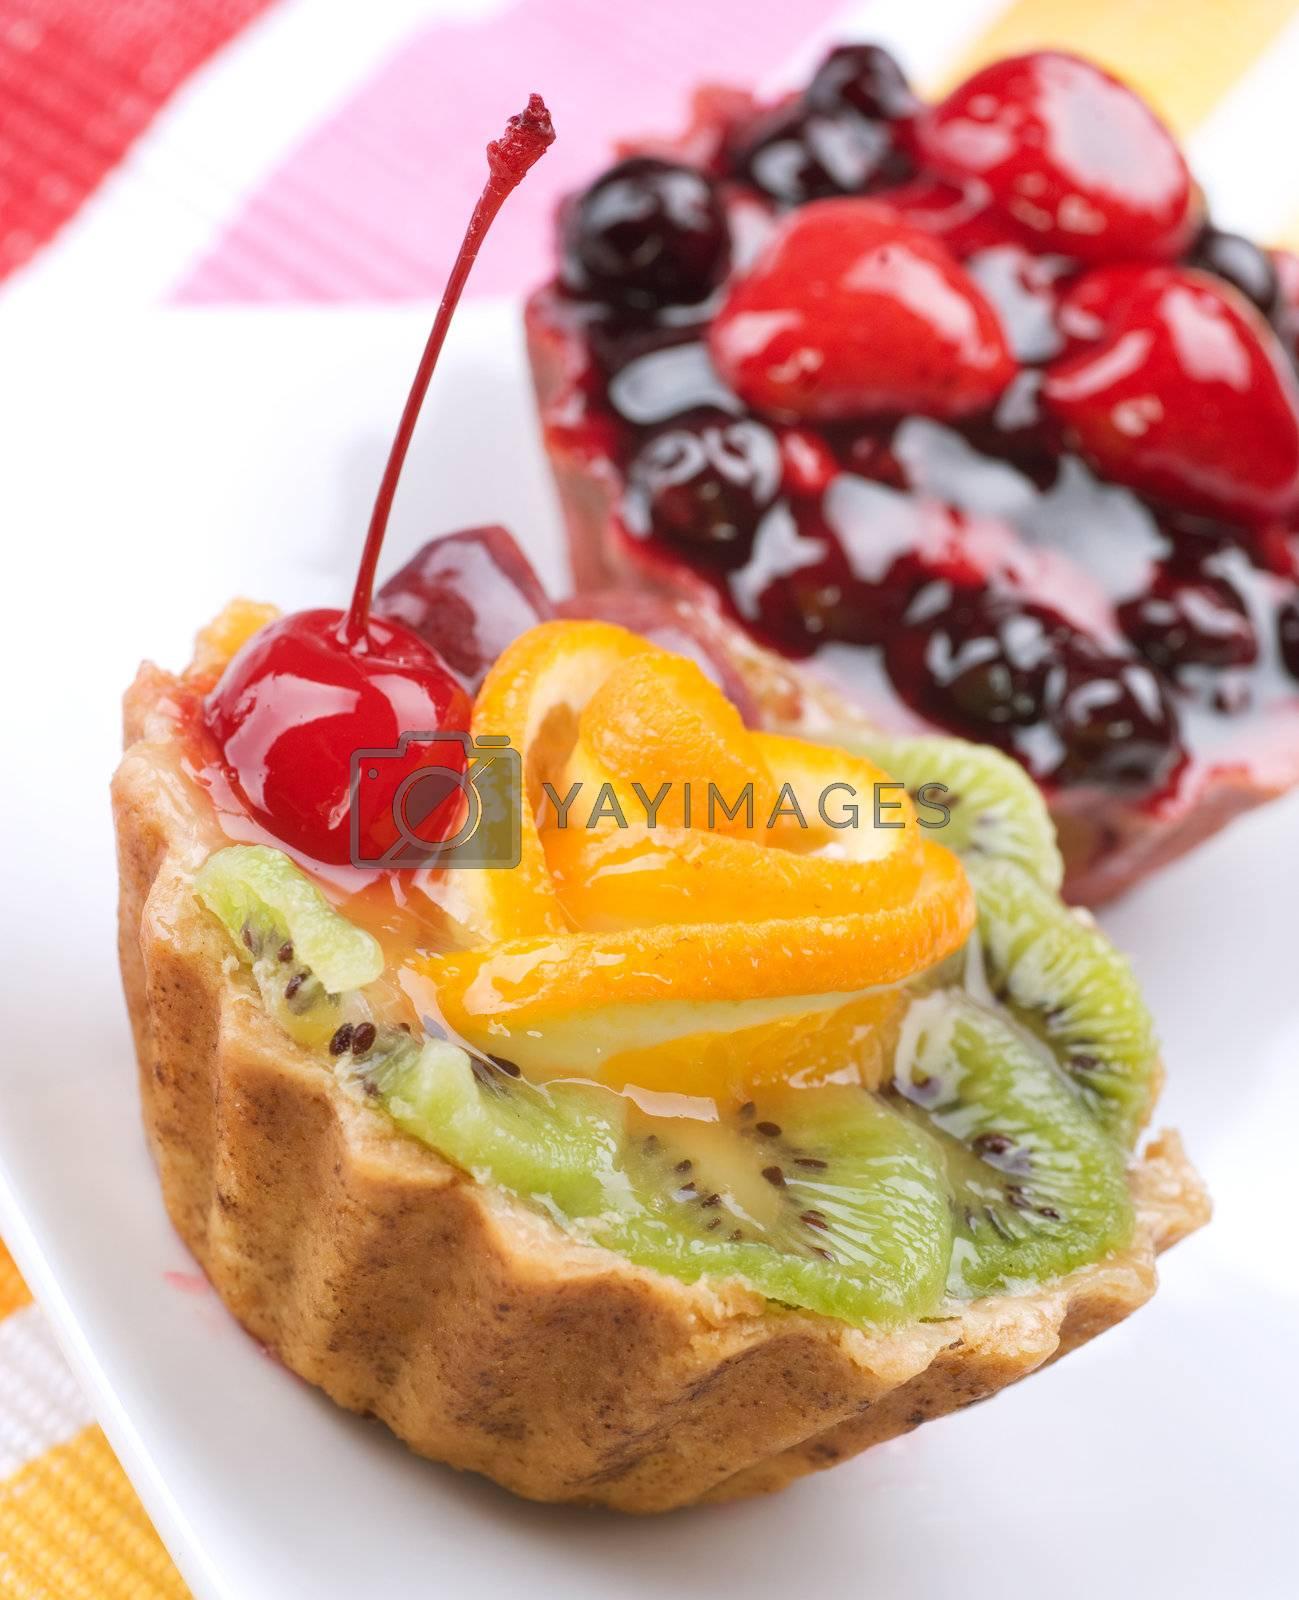 Fruit Cake by Subbotina Anna